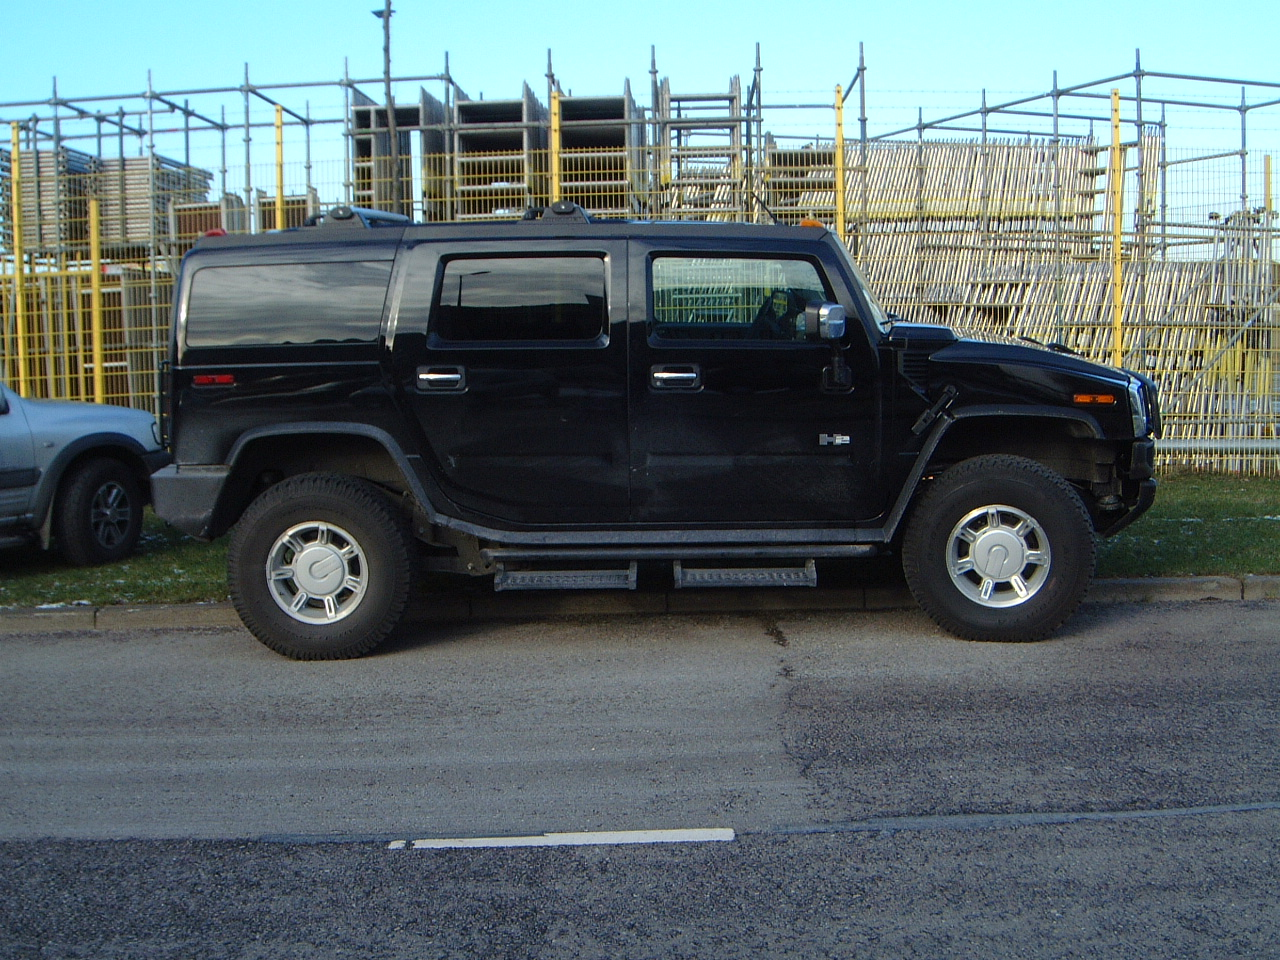 maartent hummer humvee black car vehicle tires